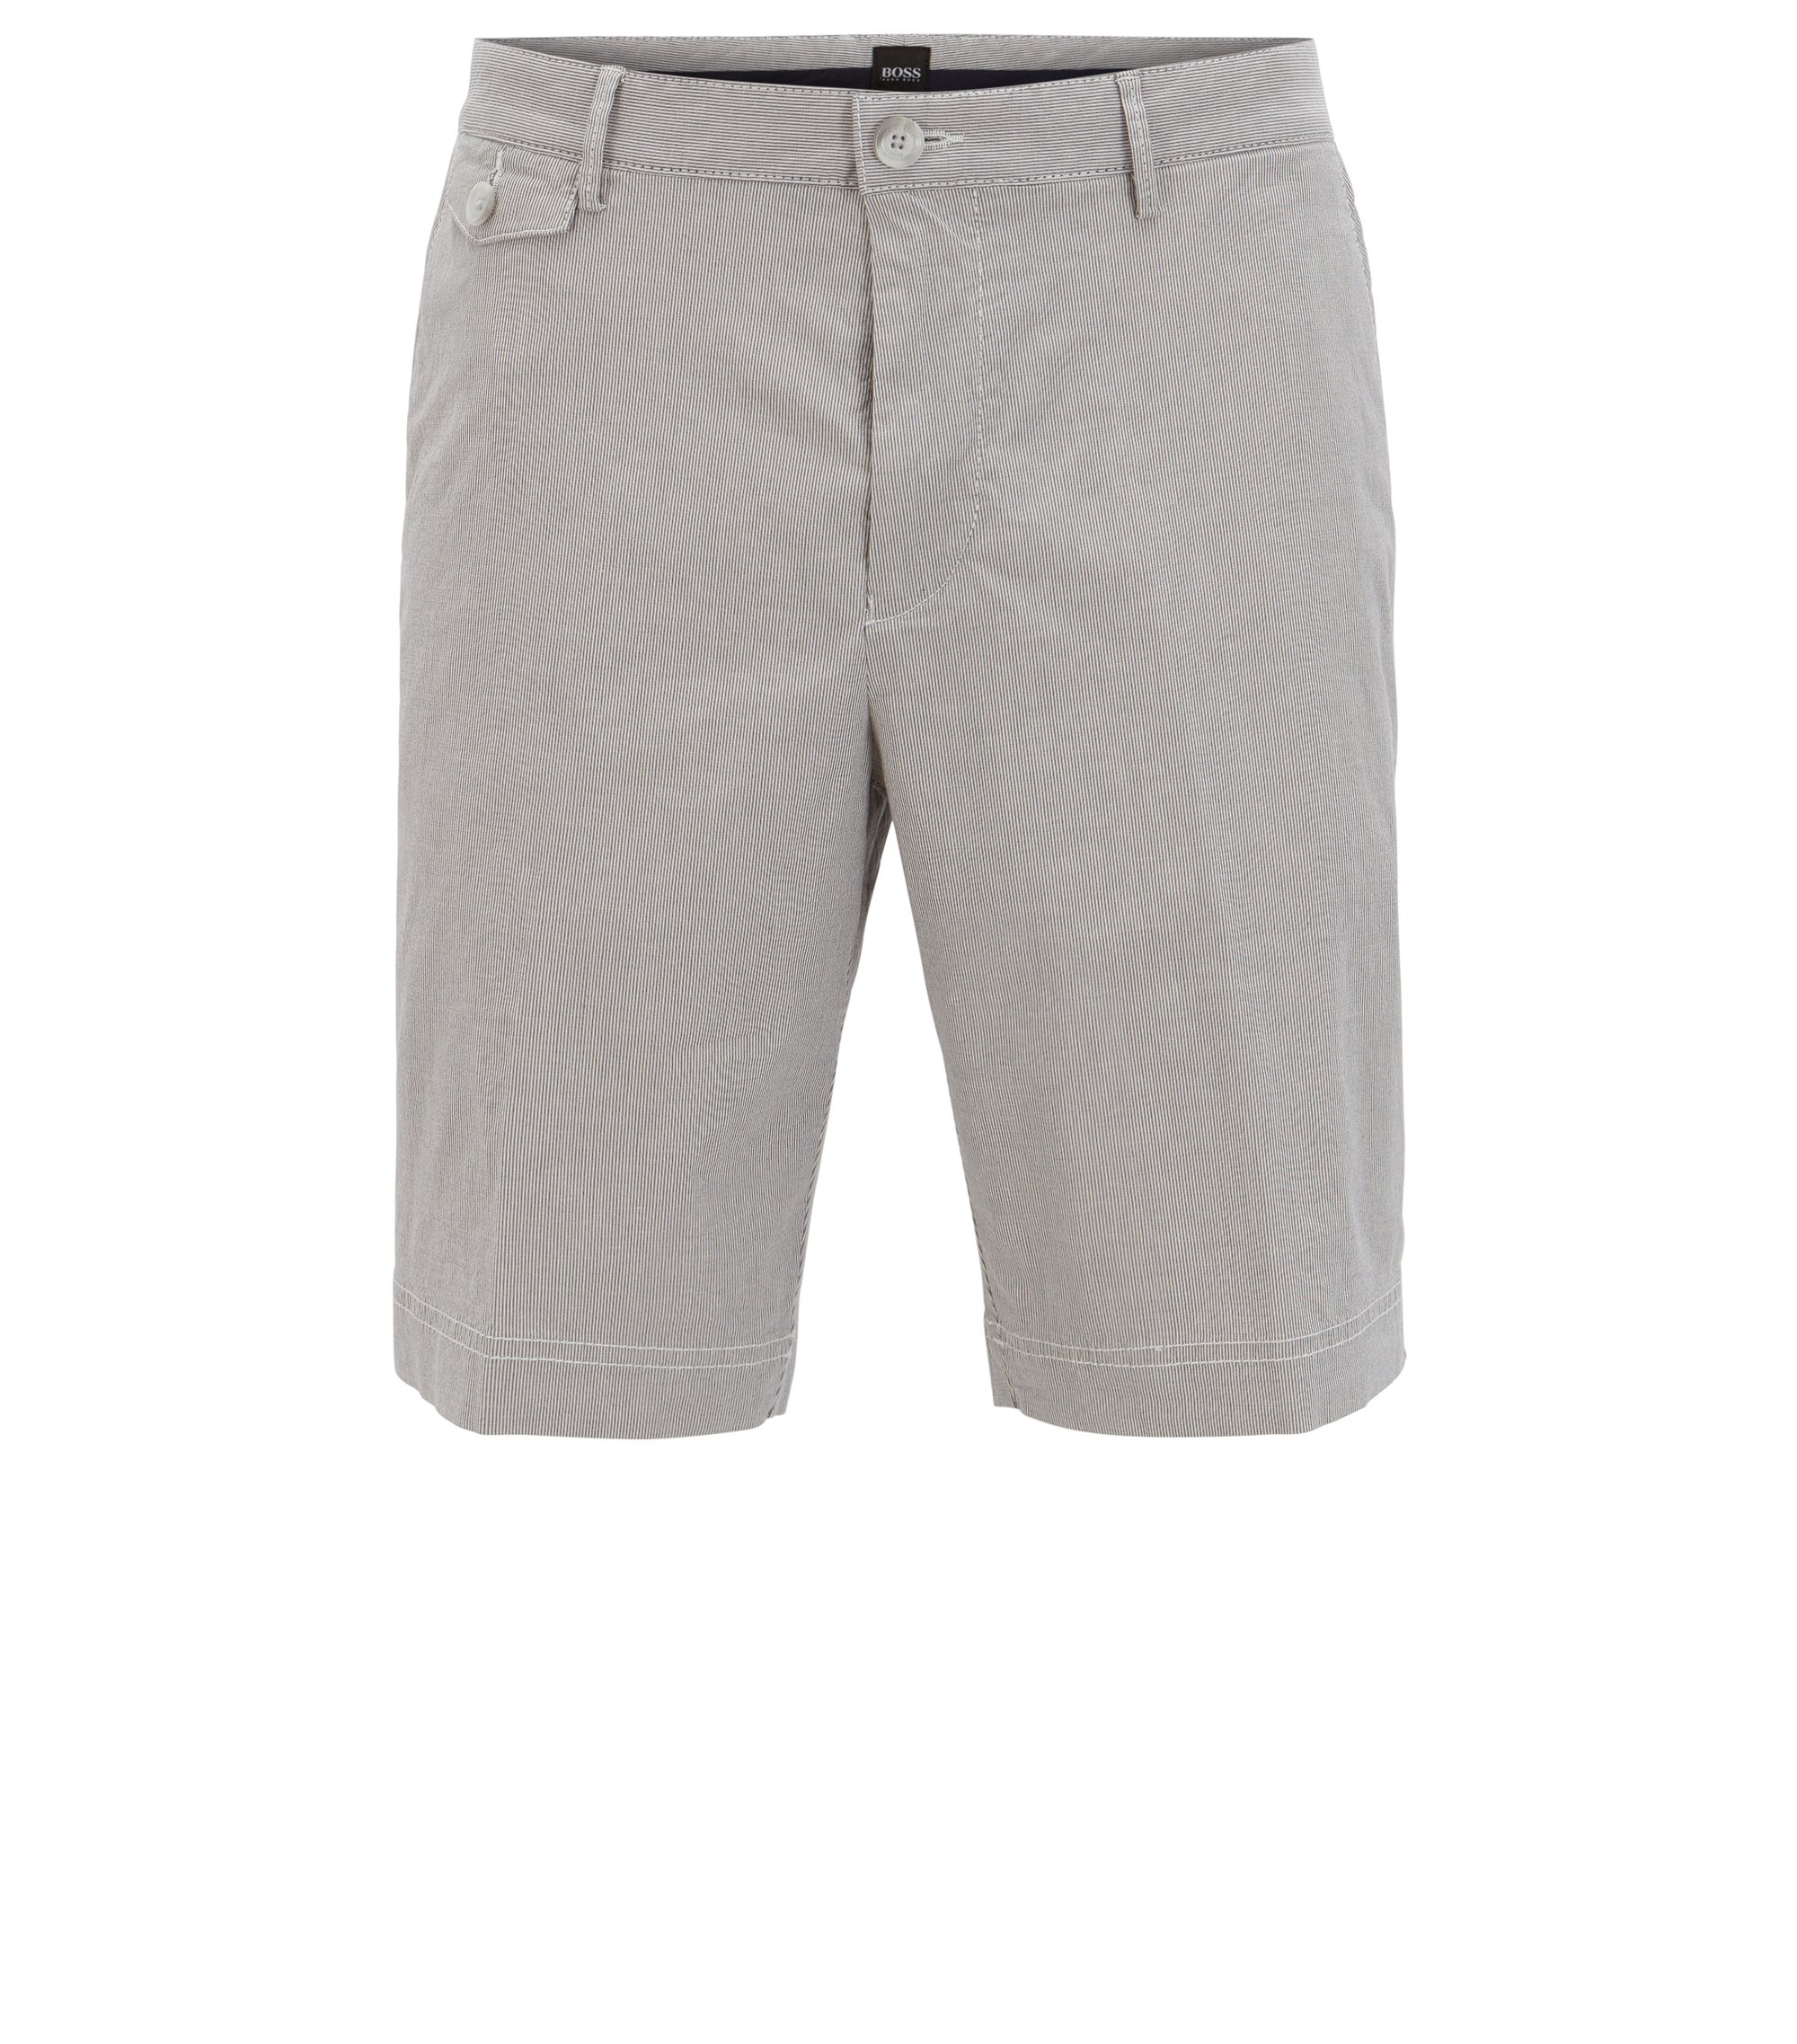 Stretch Gabardine Short, Regular Fit | Crigan Short P W, Dark Blue